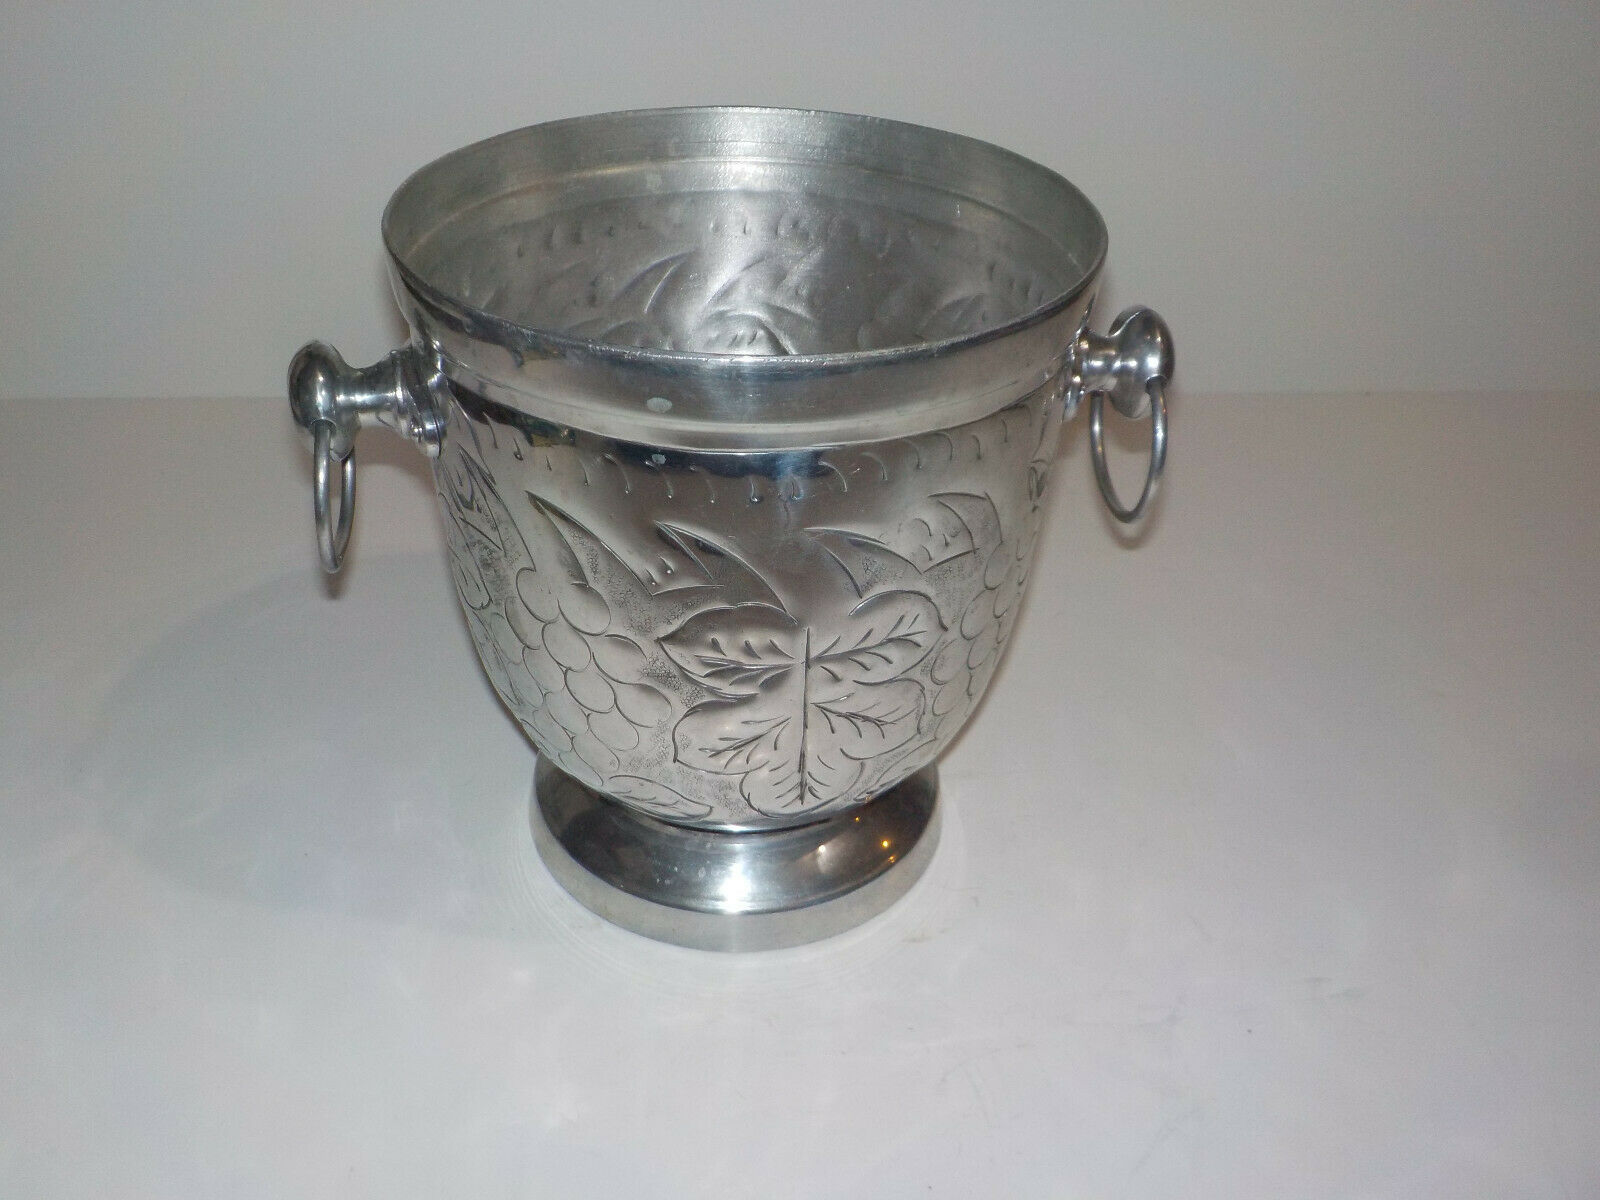 Wine Cooler Seagull Pewter Jewelled Garden Wine Chiller Bucket For Sale Online Ebay